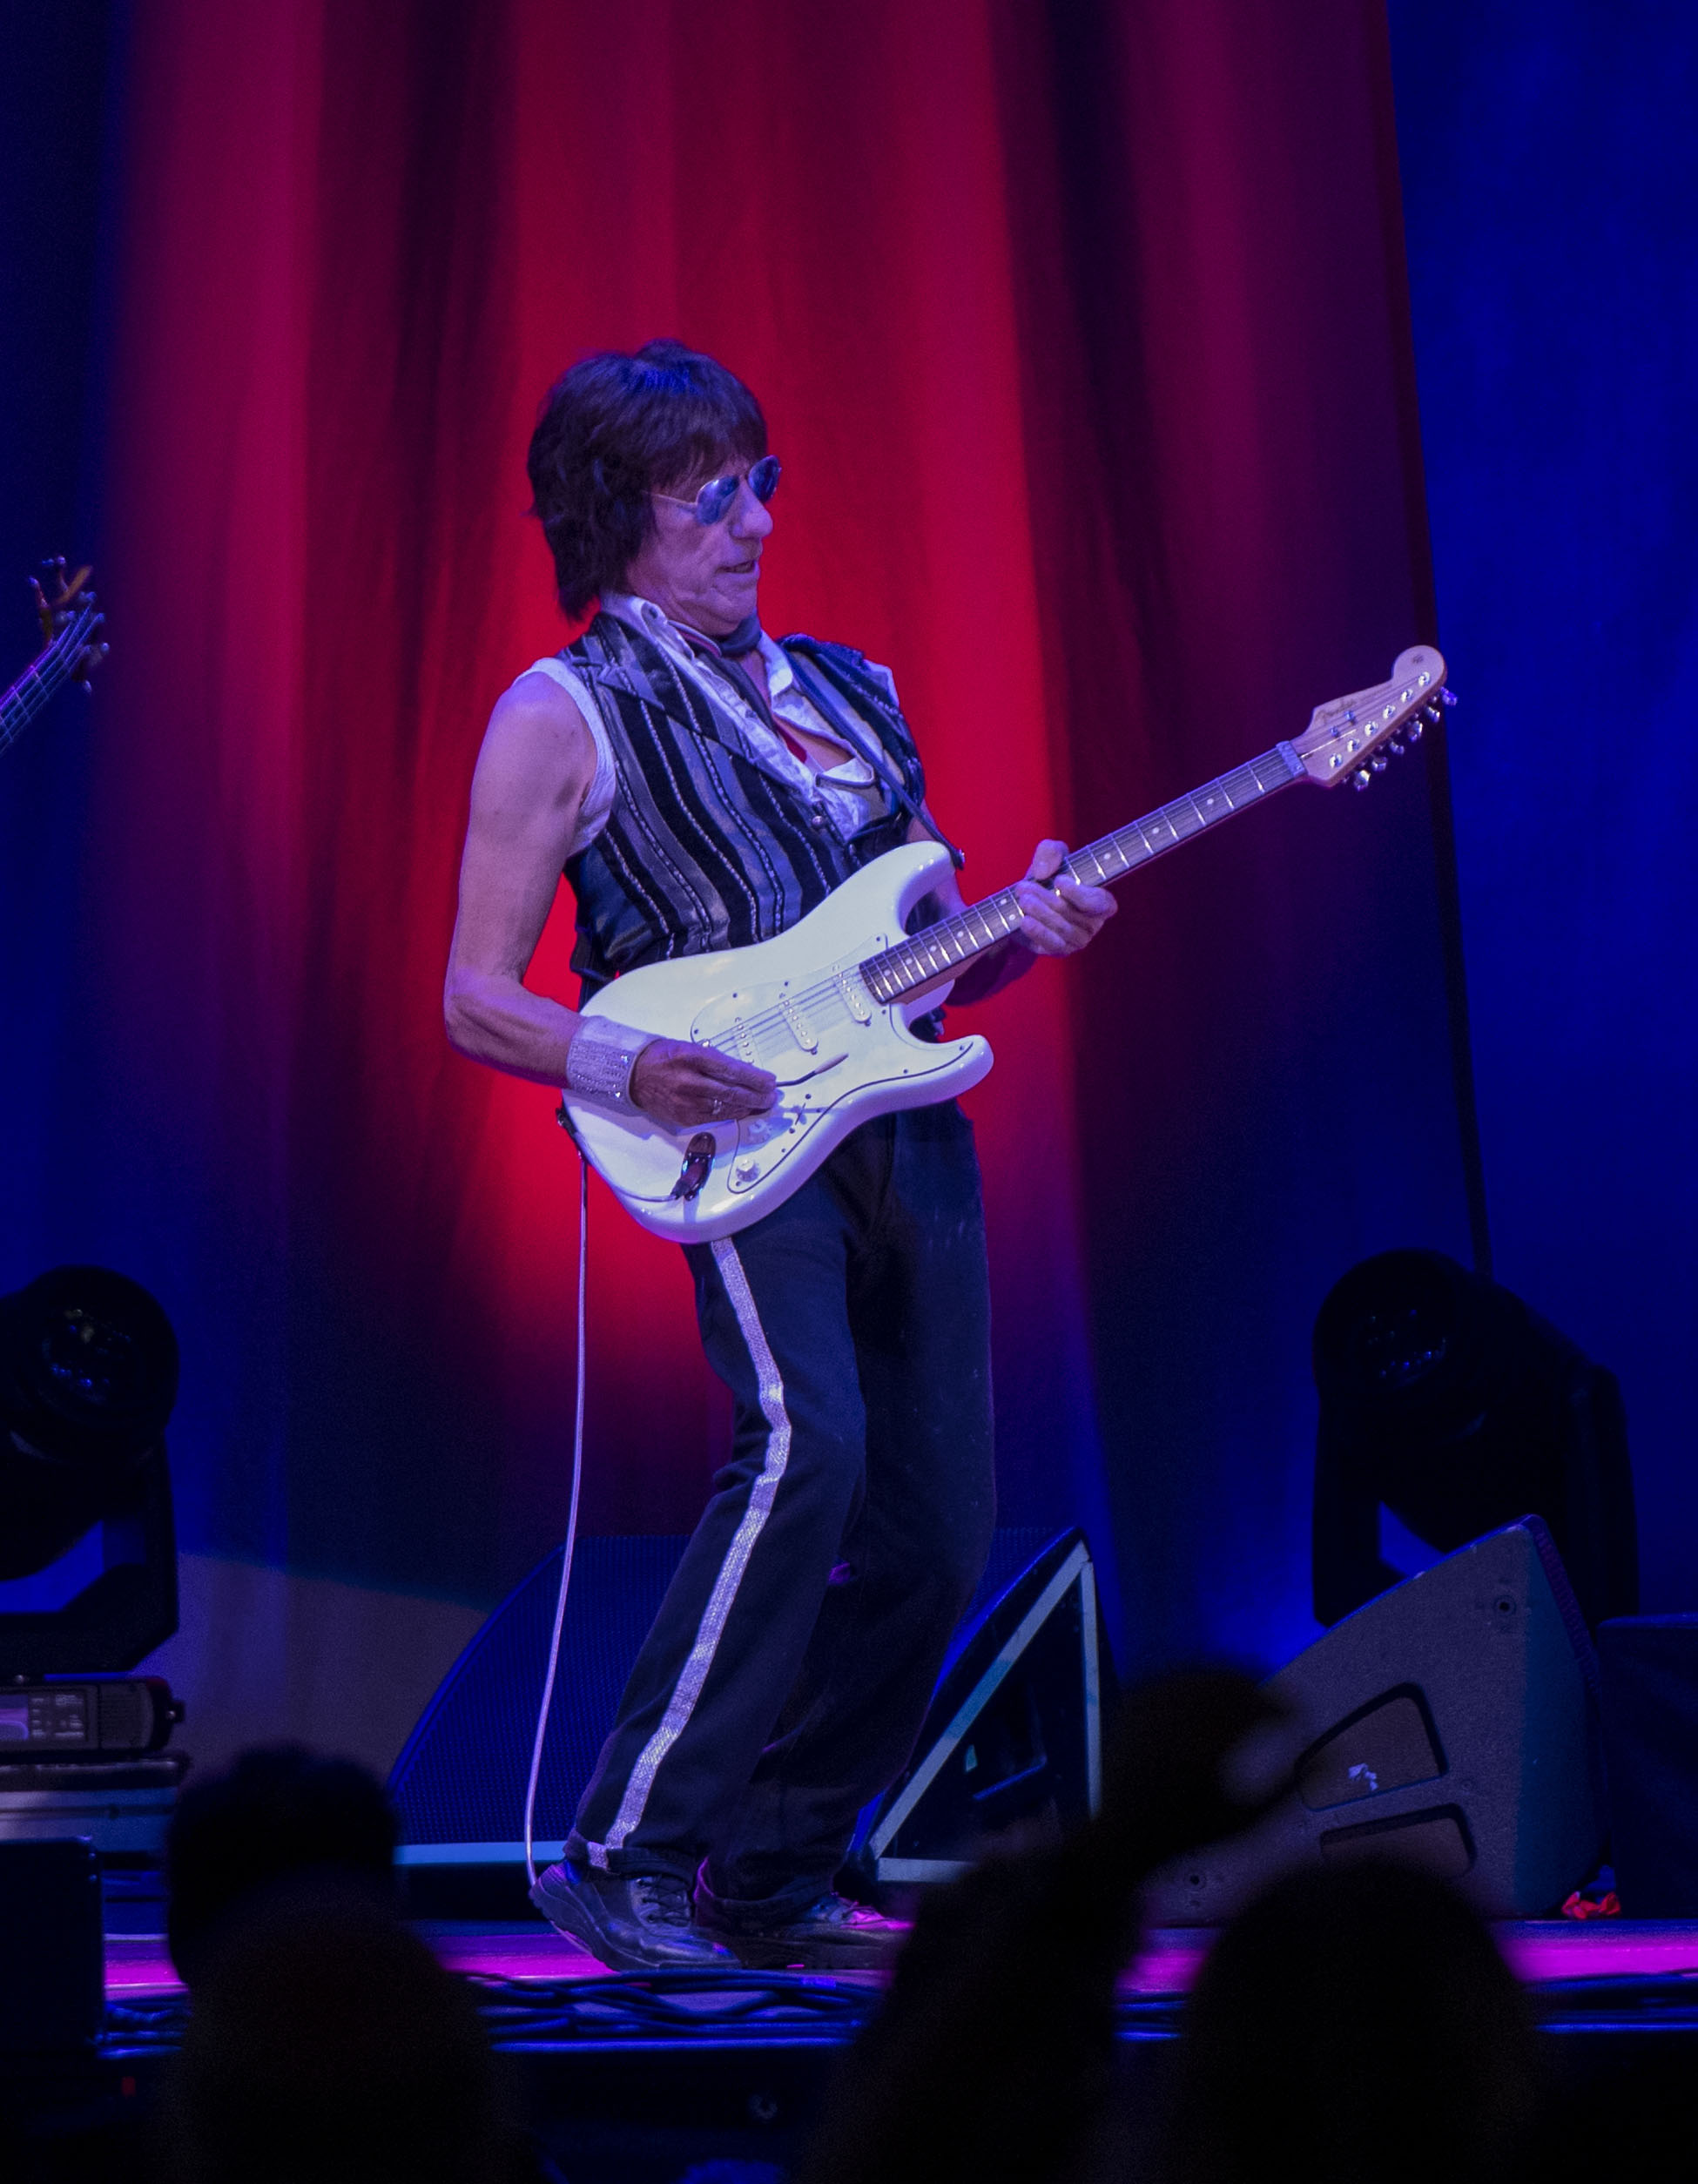 Jeff Beck at the Blue Hills Bank Pavillion, Boston, MA August 3, 2018